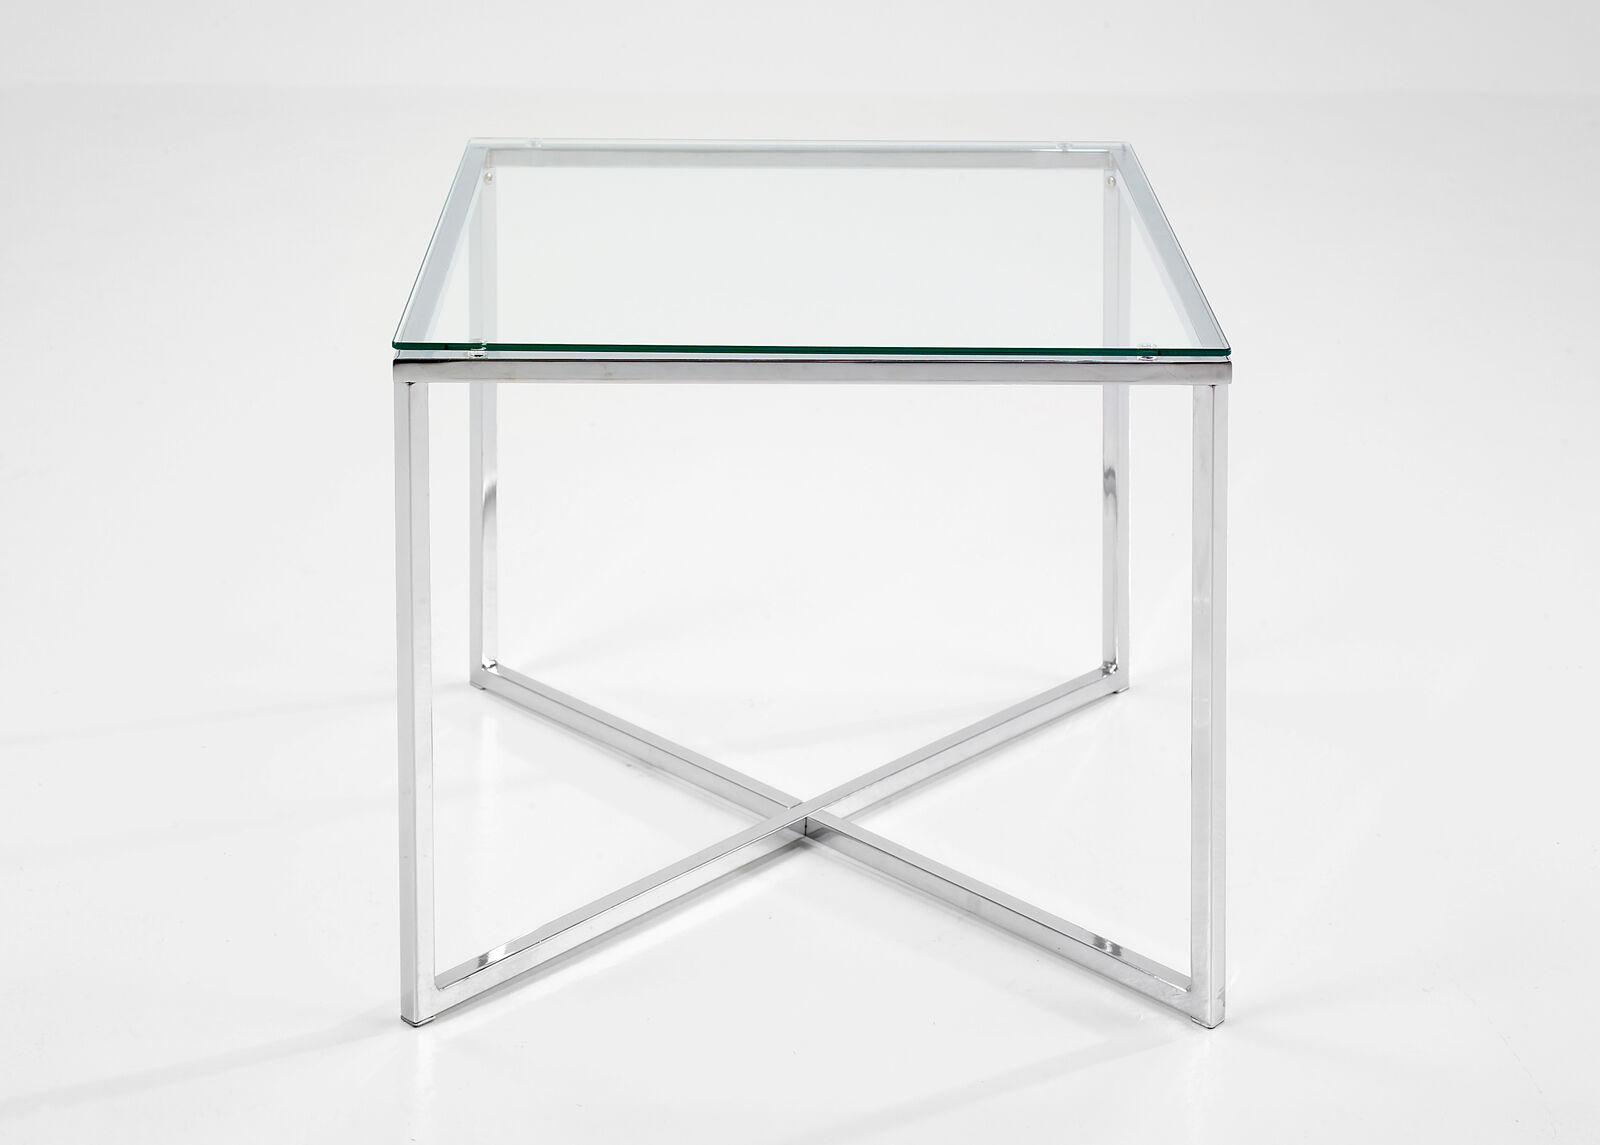 Actona Sohvapöytä CROSS 50x50 cm